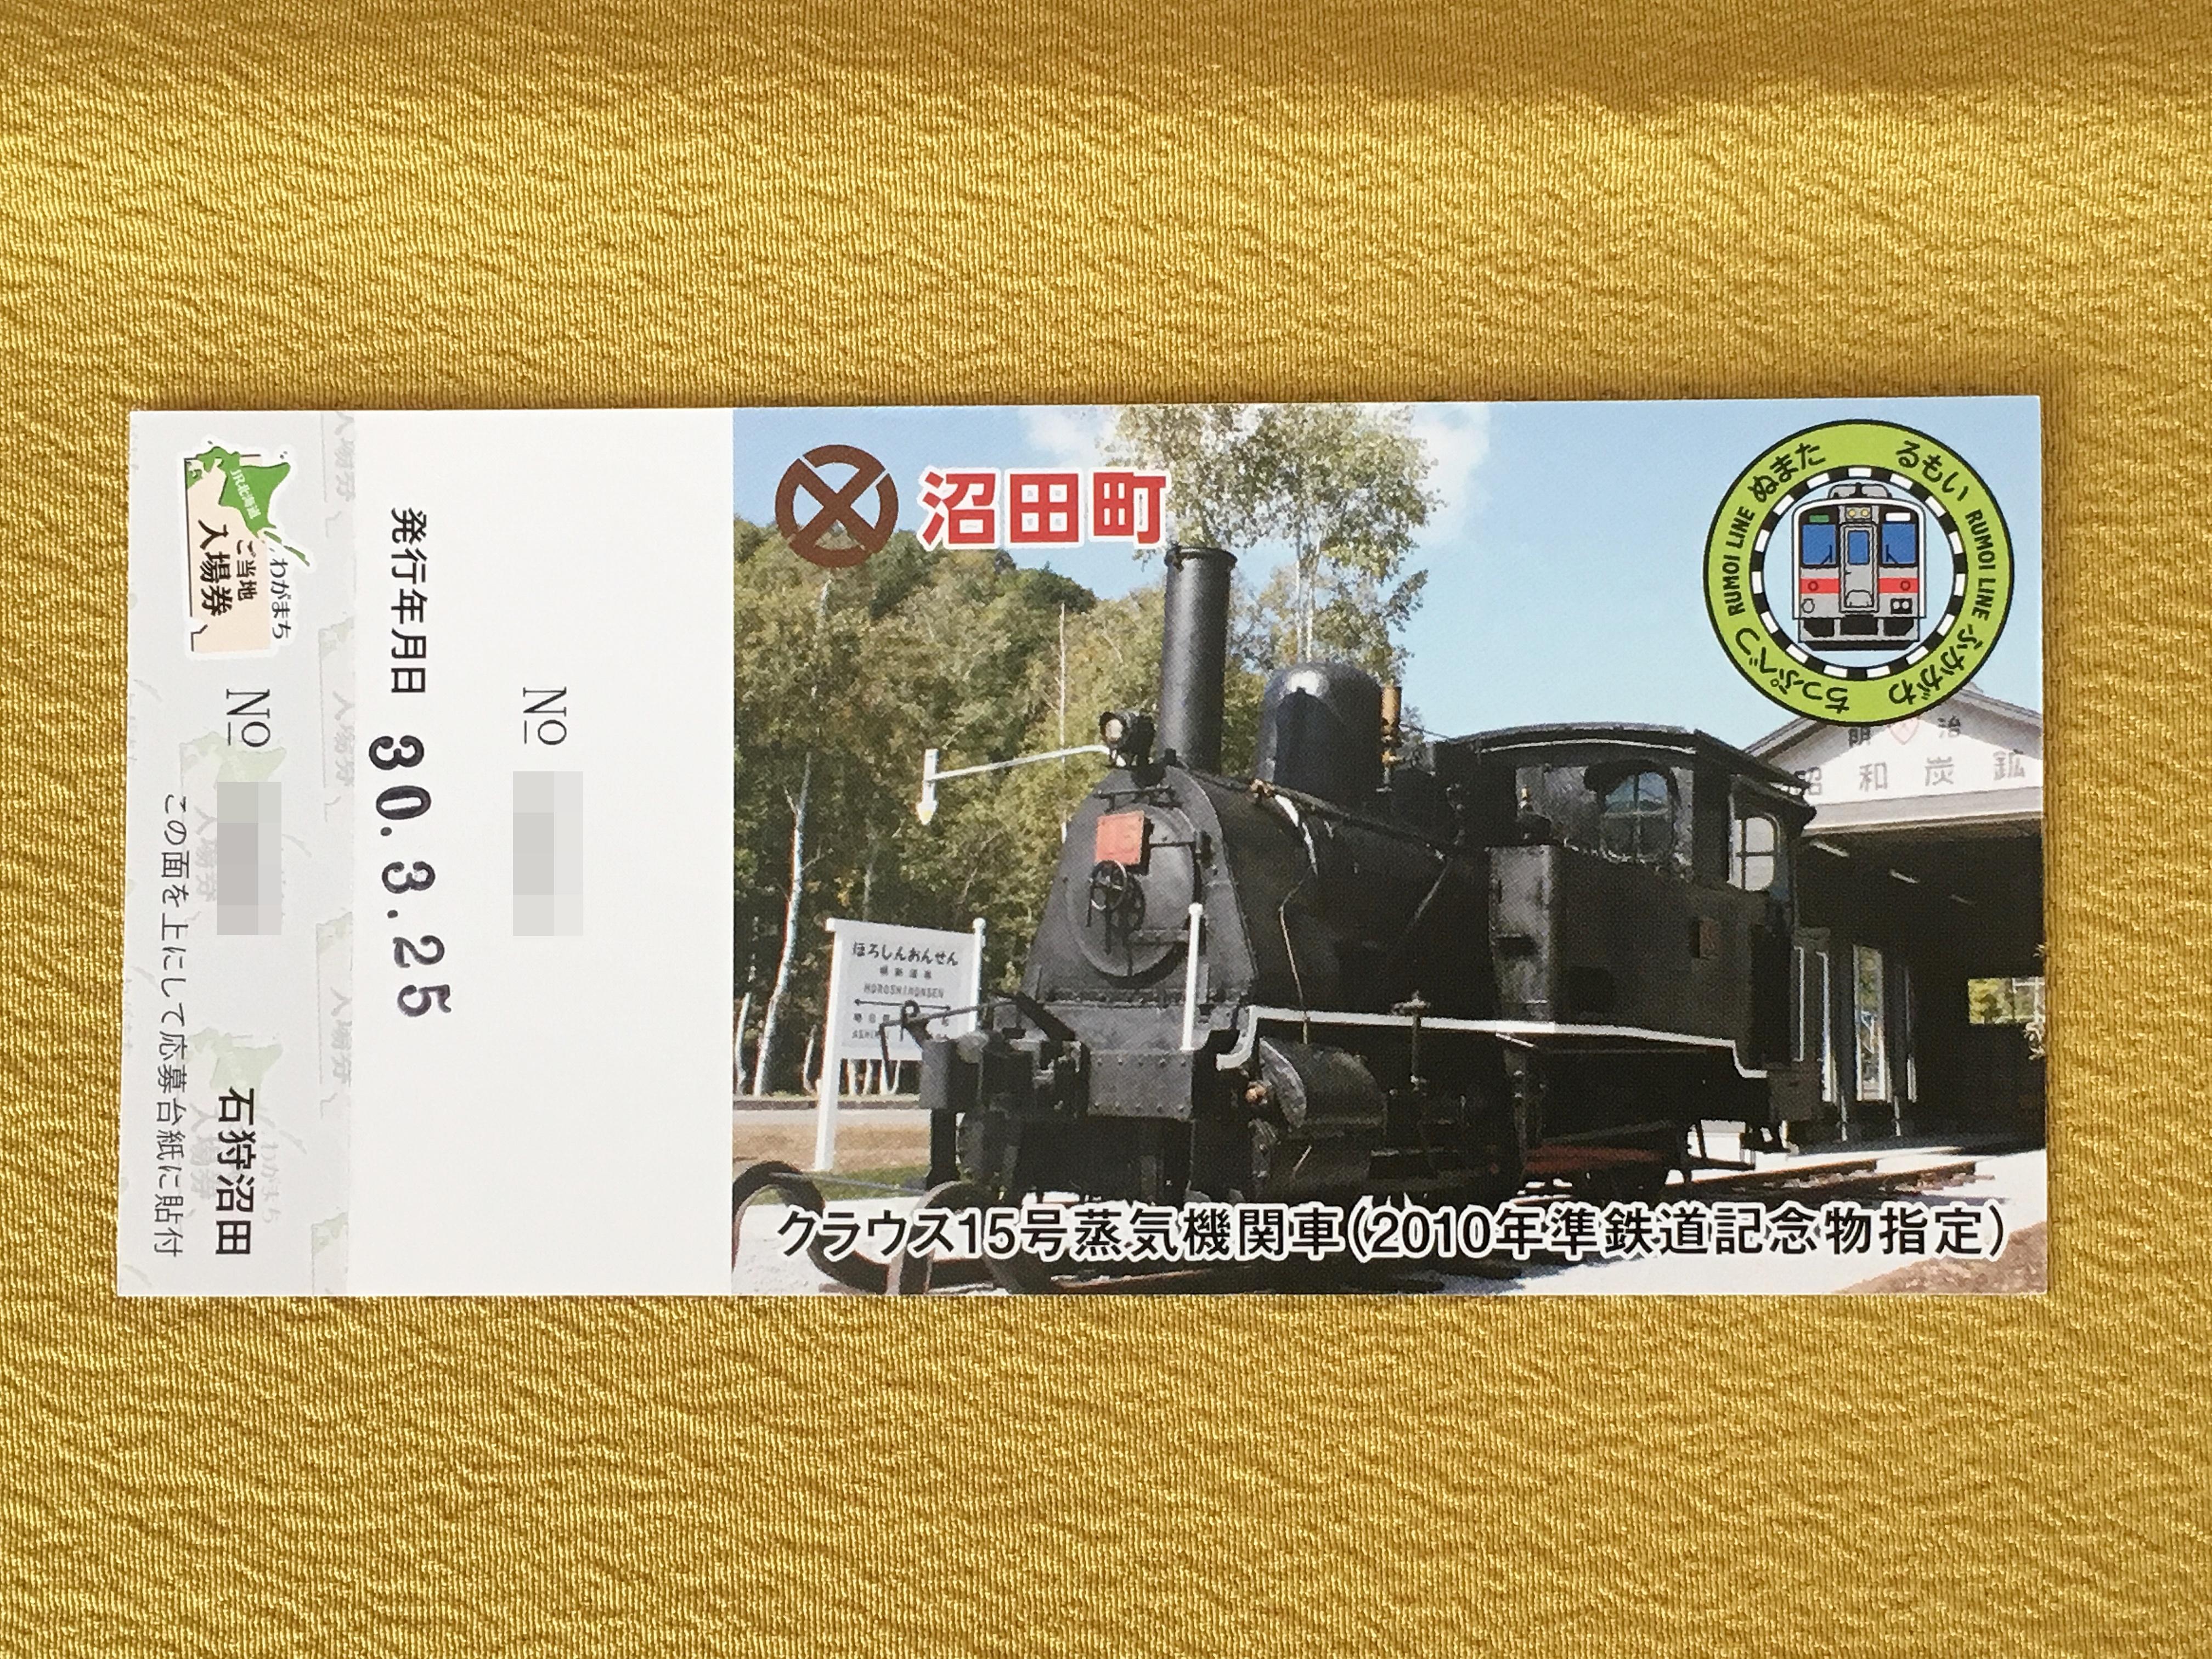 JR北海道ご当地入場券 石狩沼田駅 裏.JPG